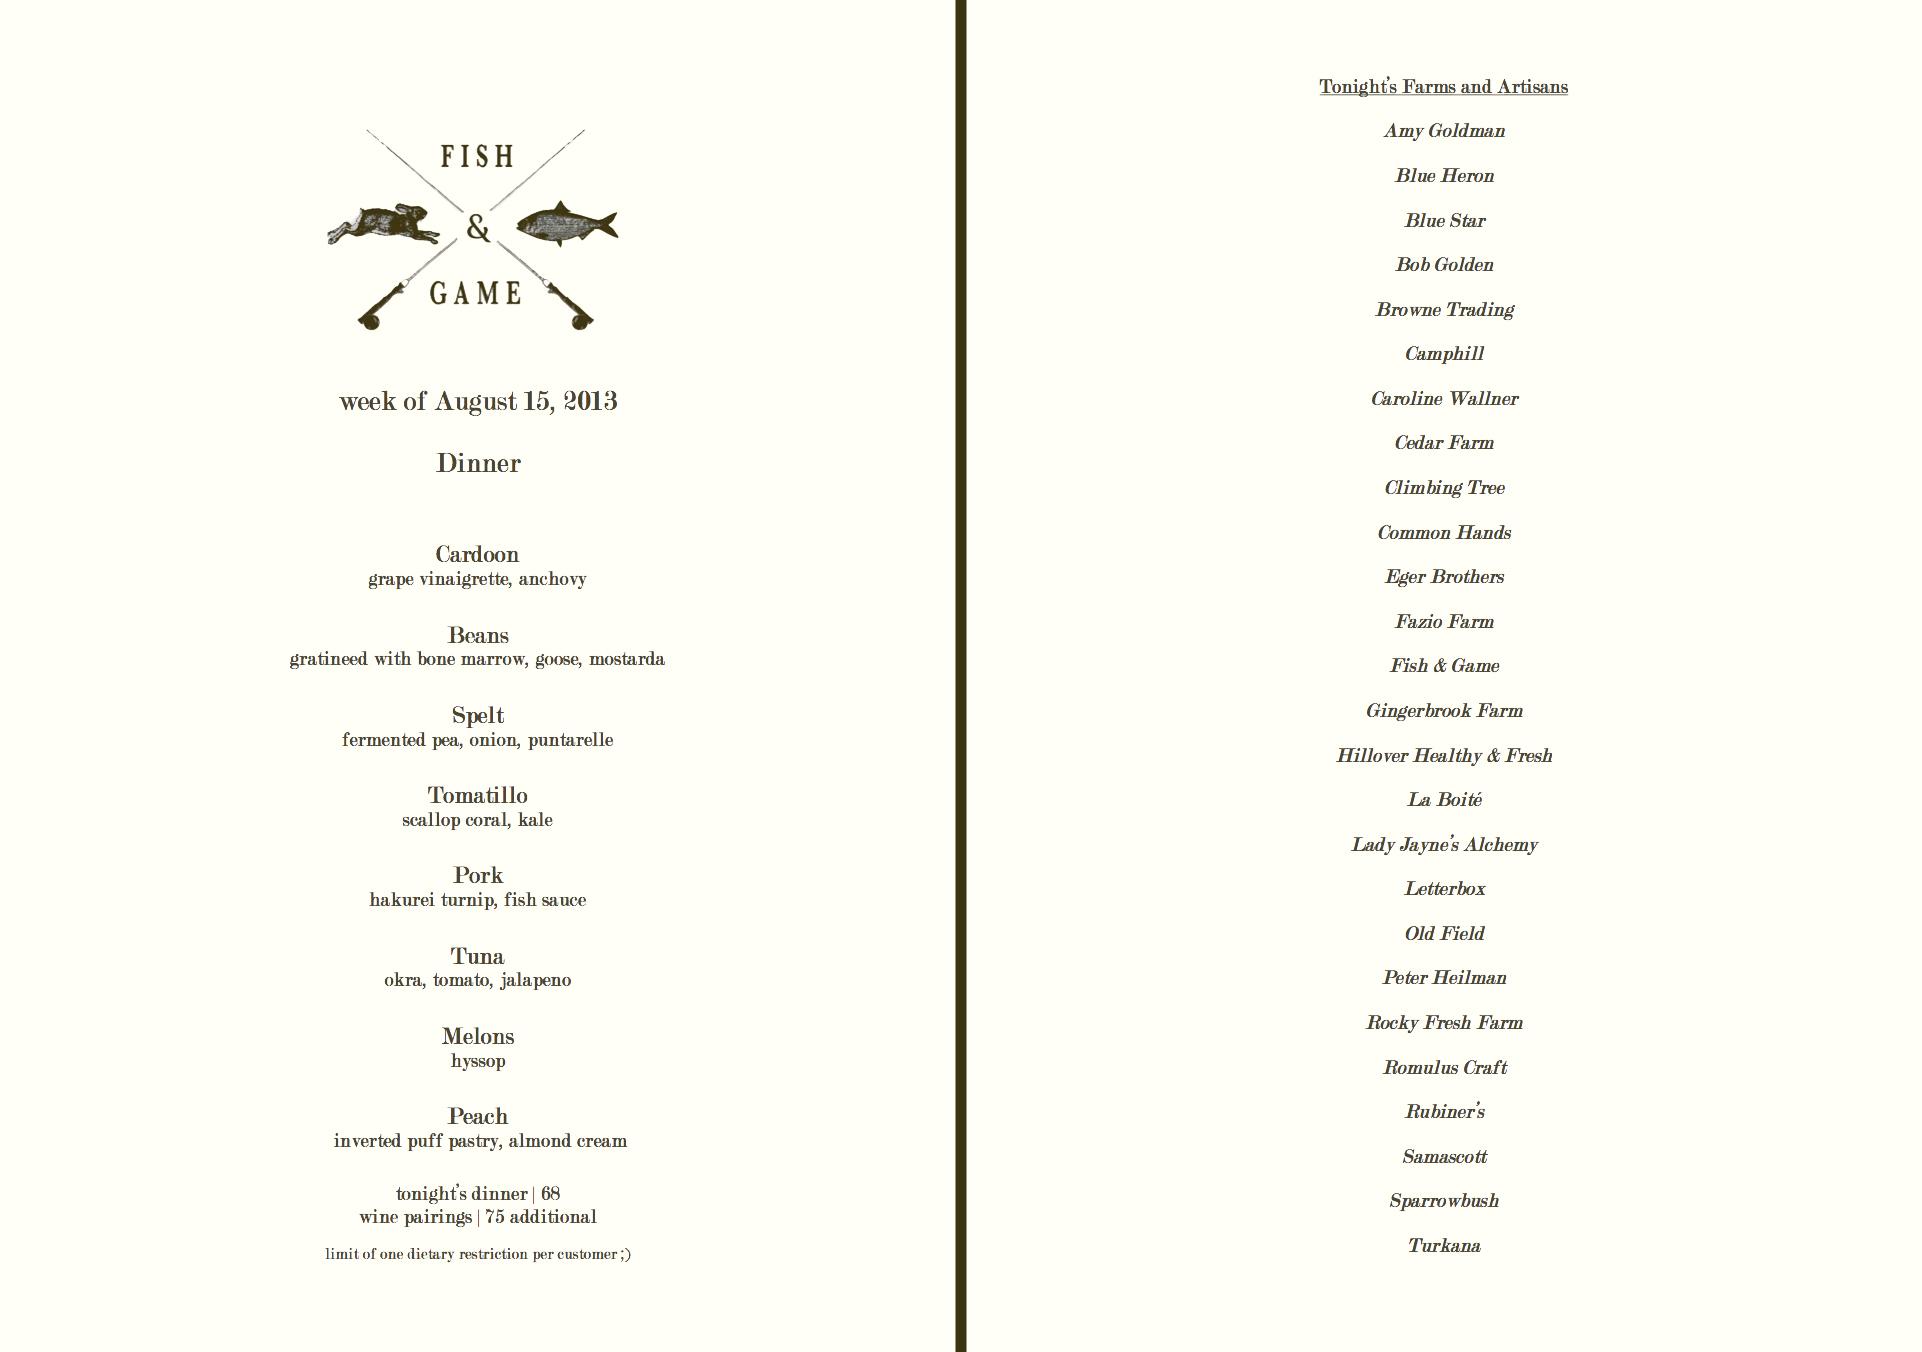 fish_and_&_game_menu_of_the_week_august_15_2013.jpg